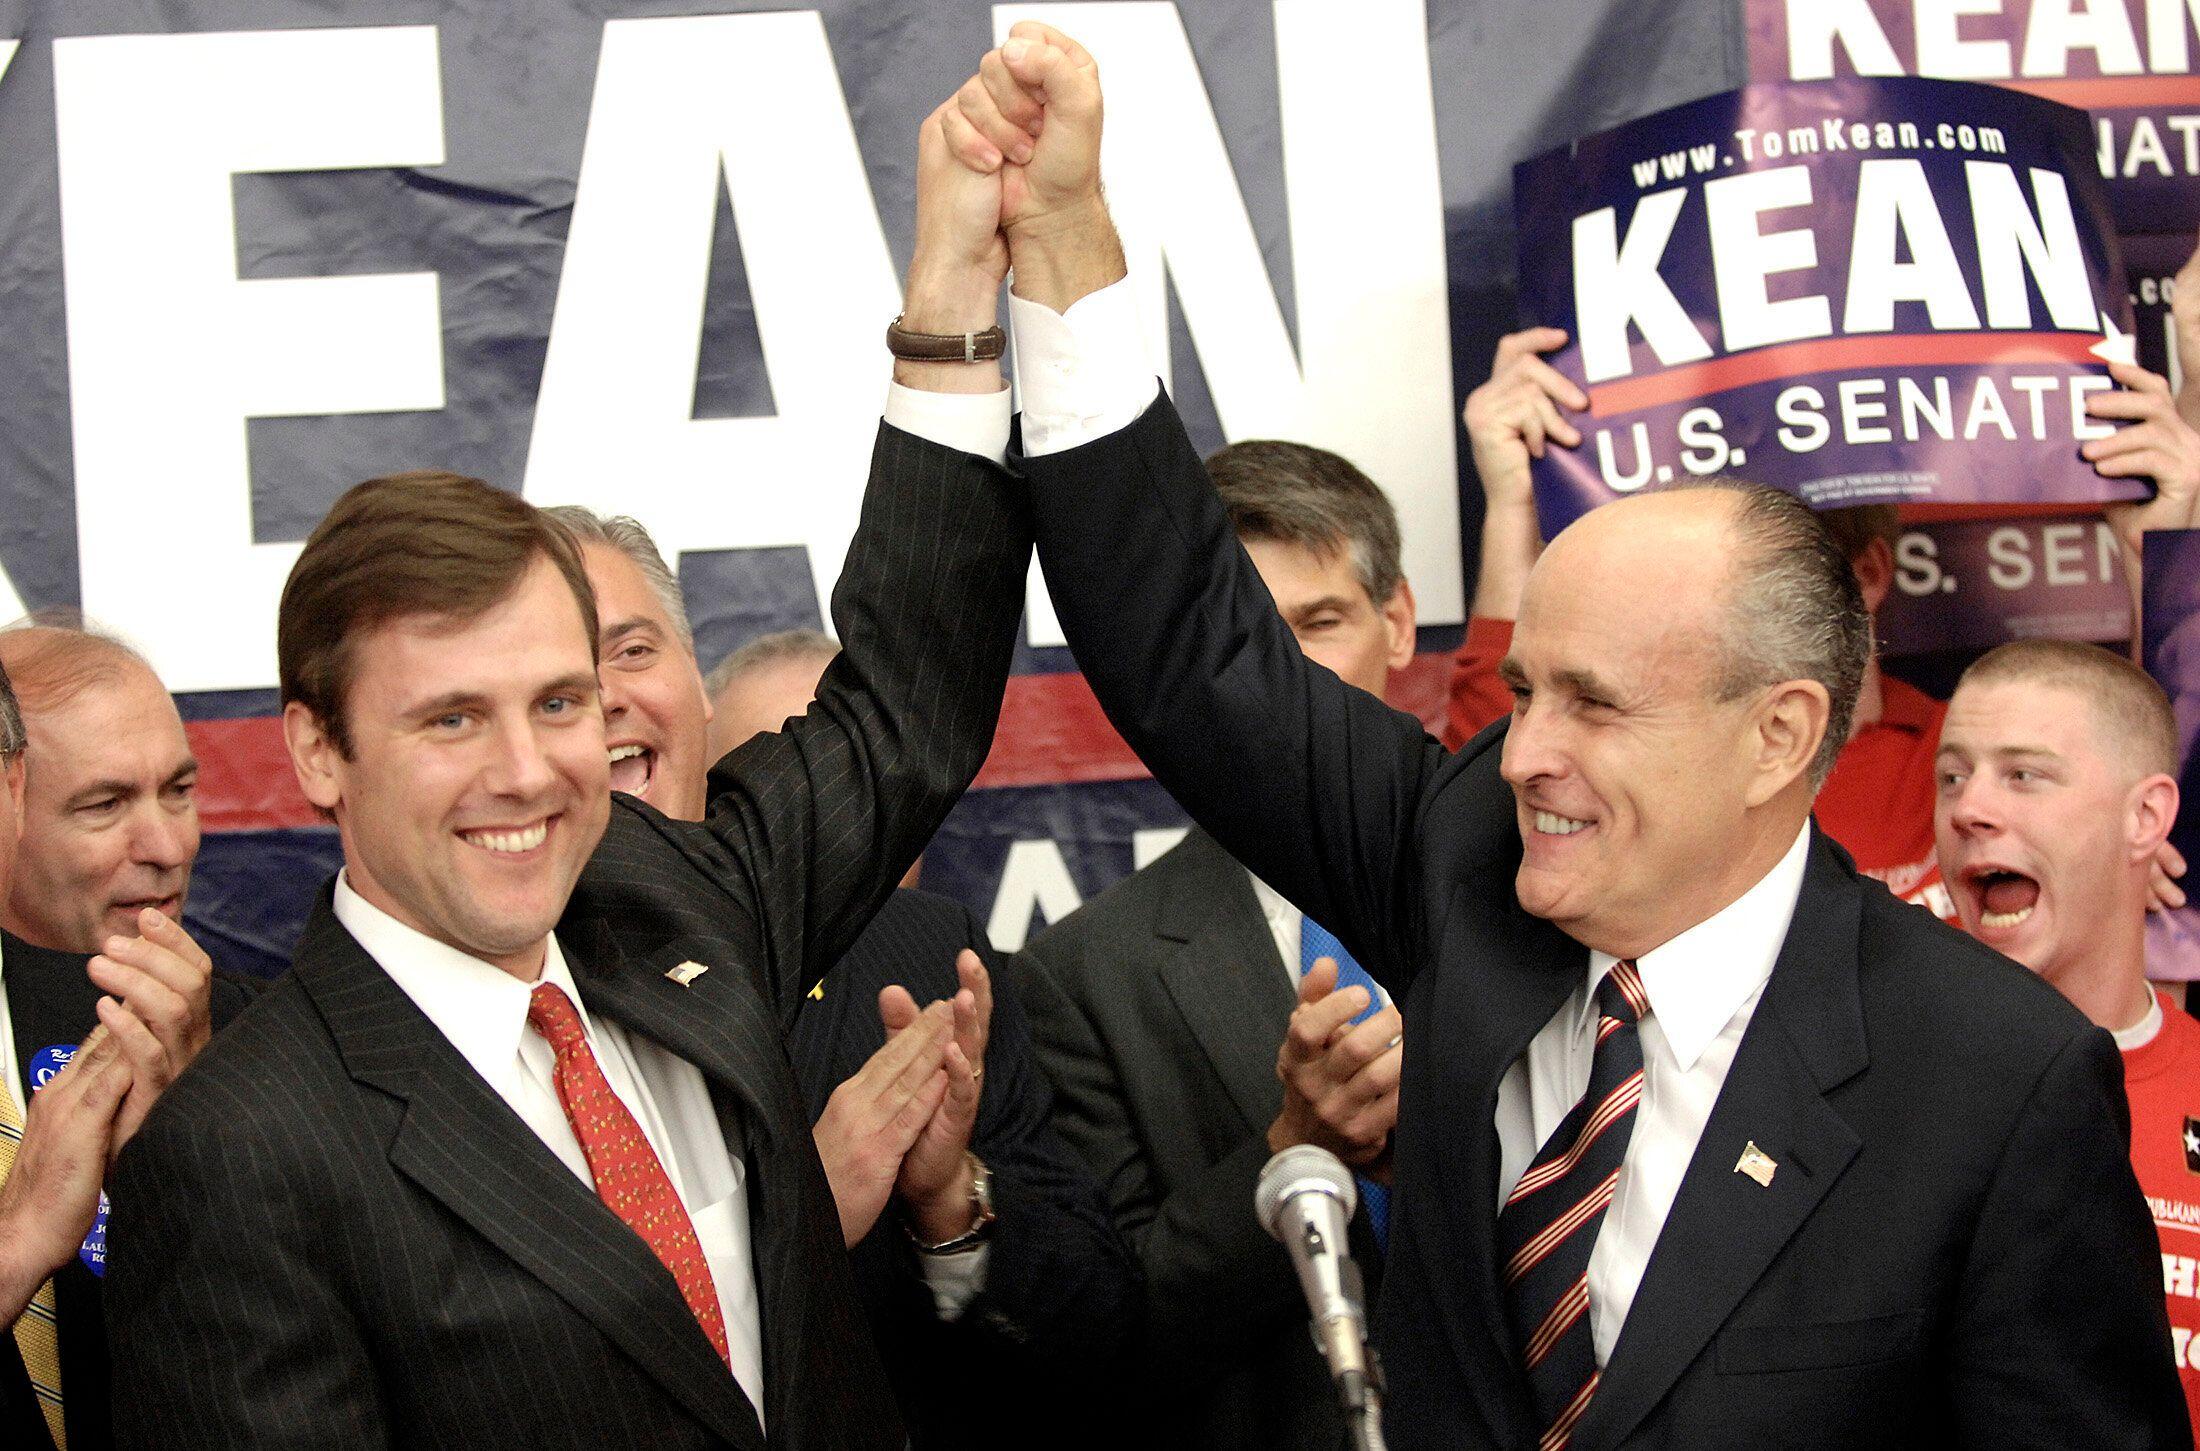 Tom Kean Jr. campaigns with former New York City Mayor Rudy Giuliani during Kean's losing bid for the U.S. Senate in 2006.